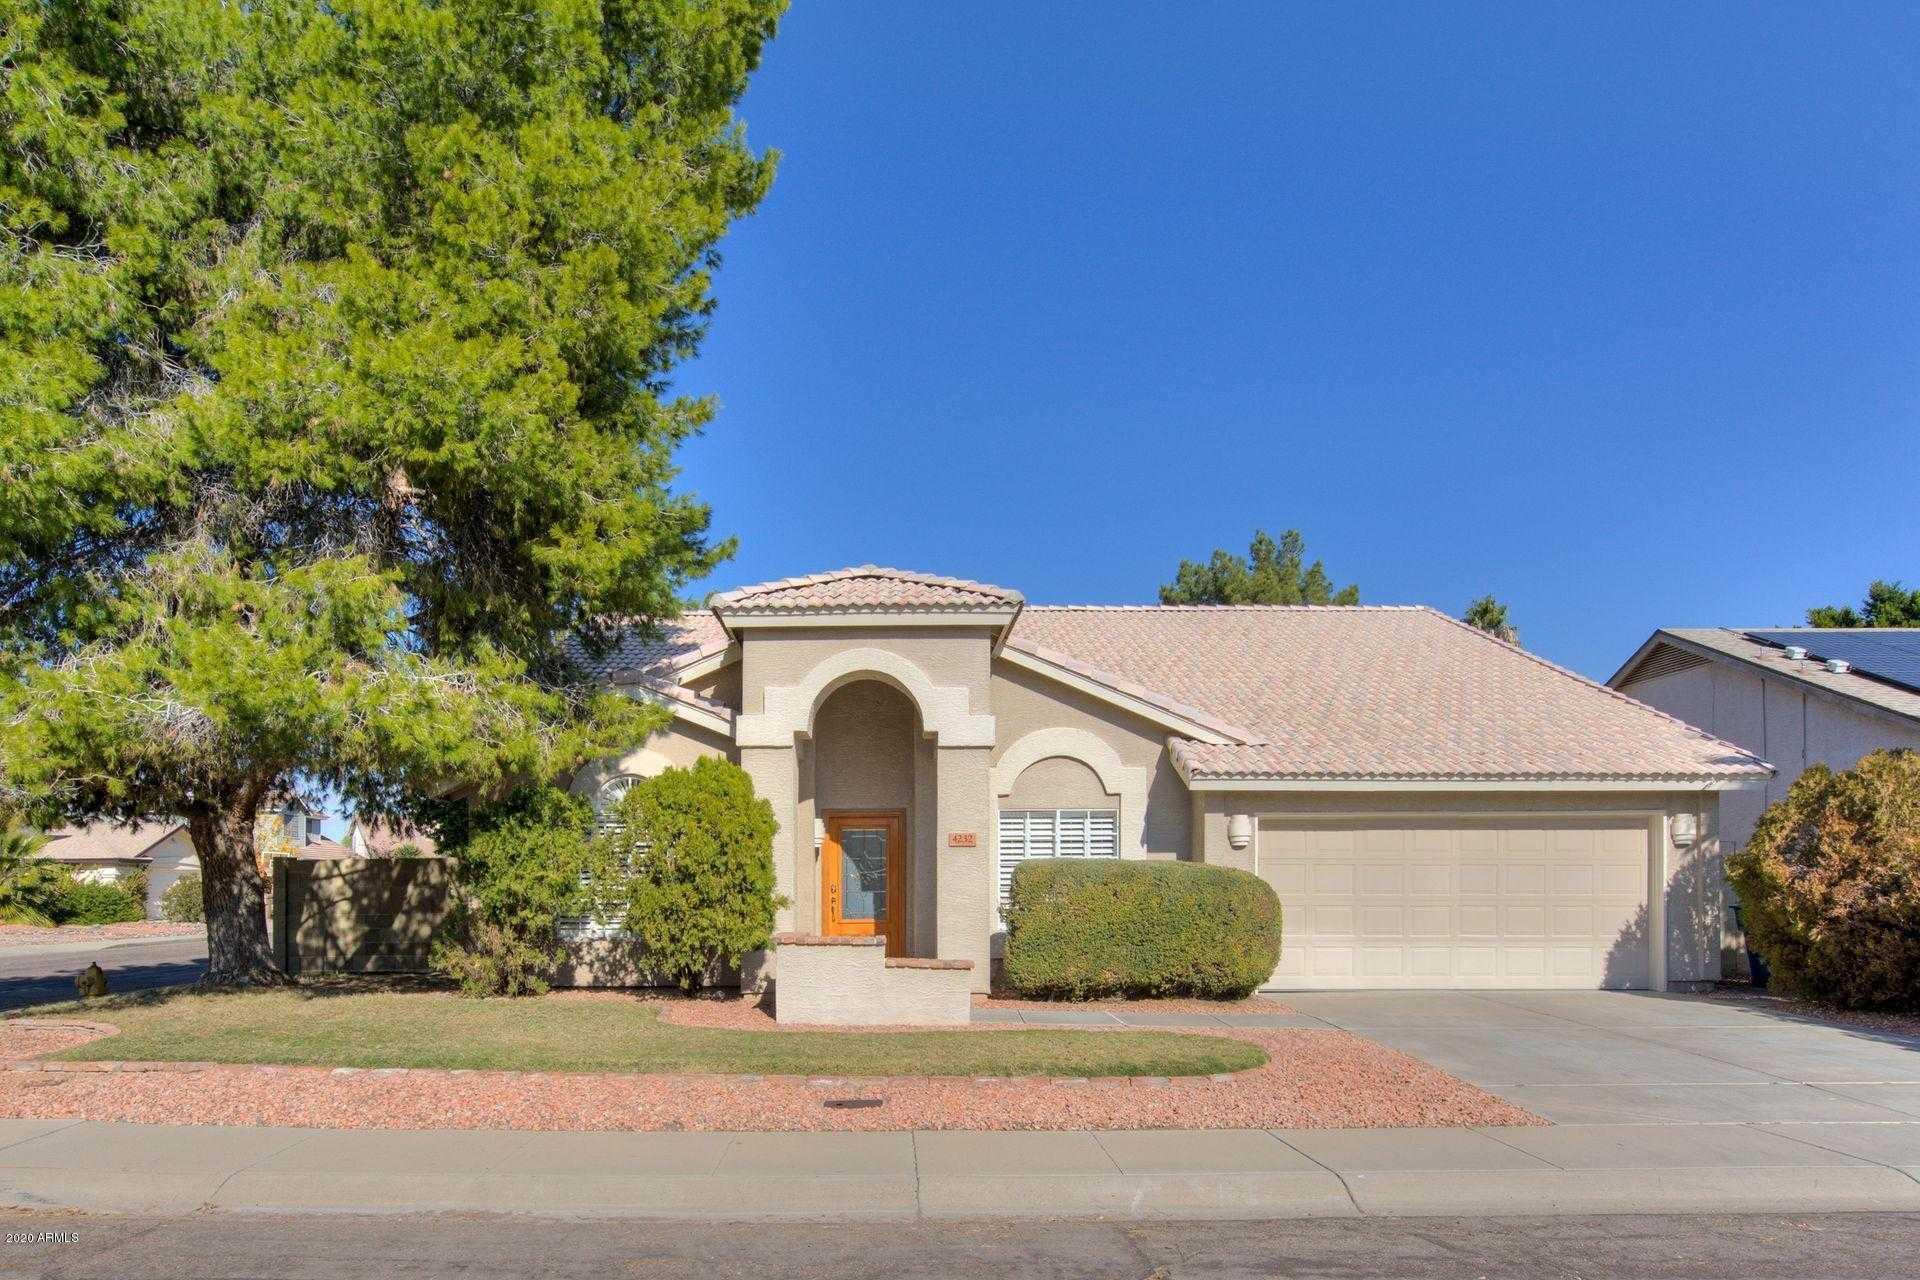 $350,000 - 4Br/2Ba - Home for Sale in Adobe Hills Lot 1-260, Glendale